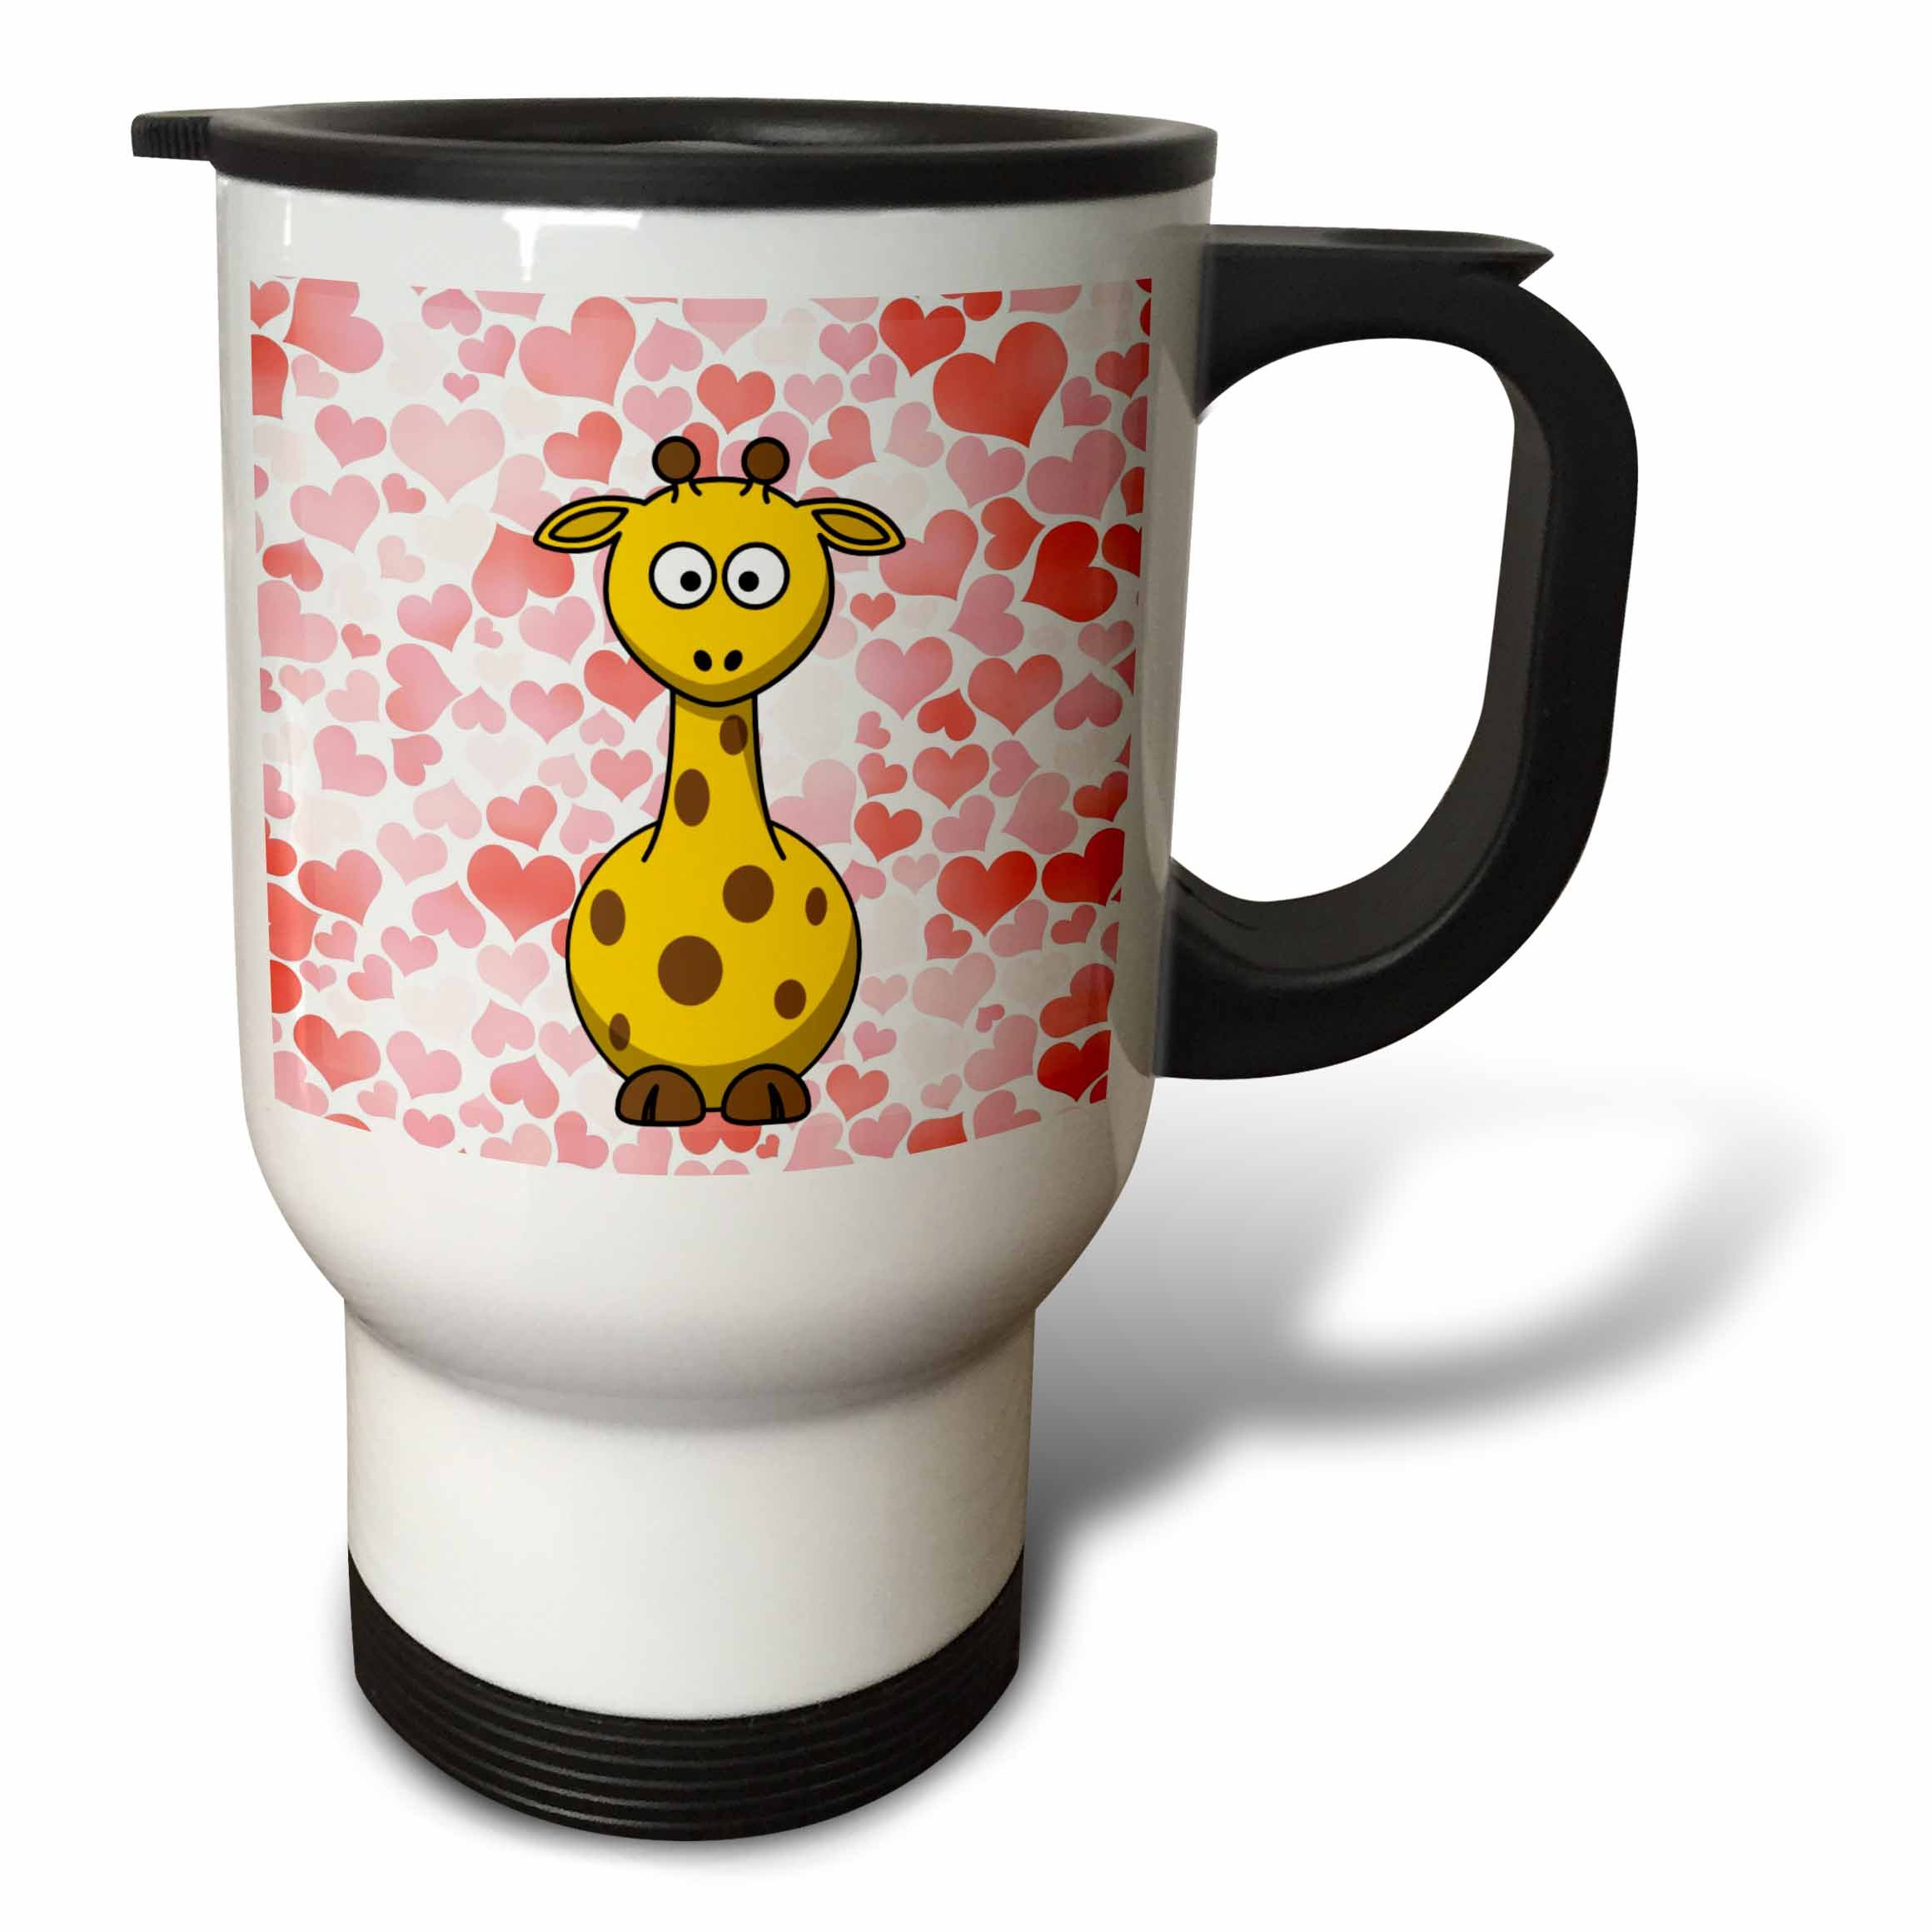 3dRose Giraffe with Hearts, Cute Animal Art, Childrens Art, Stainless Steel Travel Mug, 14-Oz